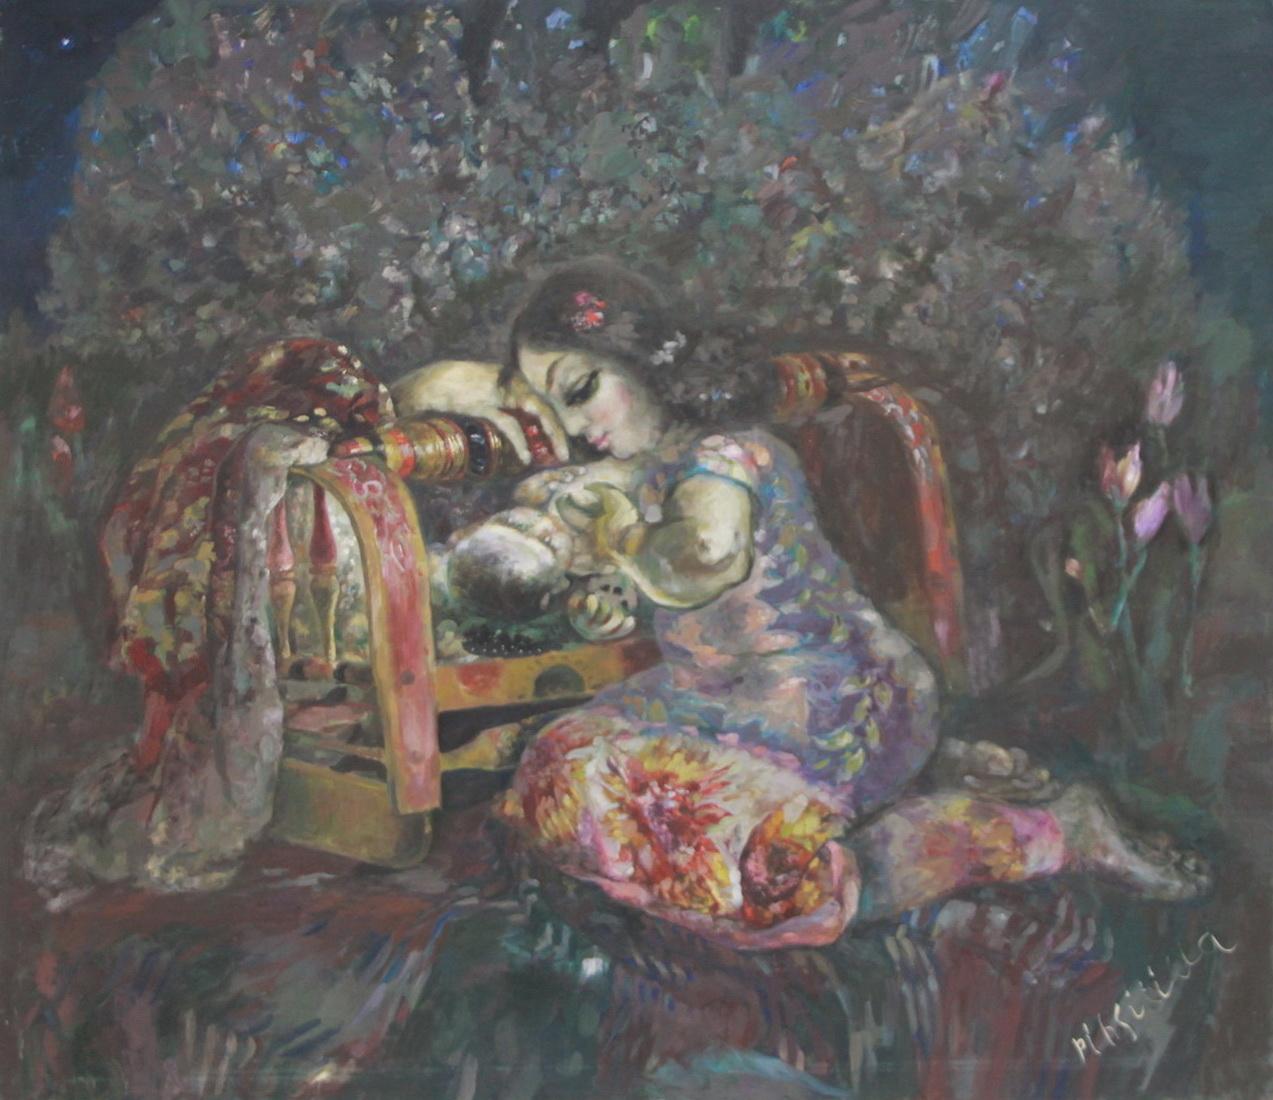 Рихситилла Акрамов. Порог. 2016